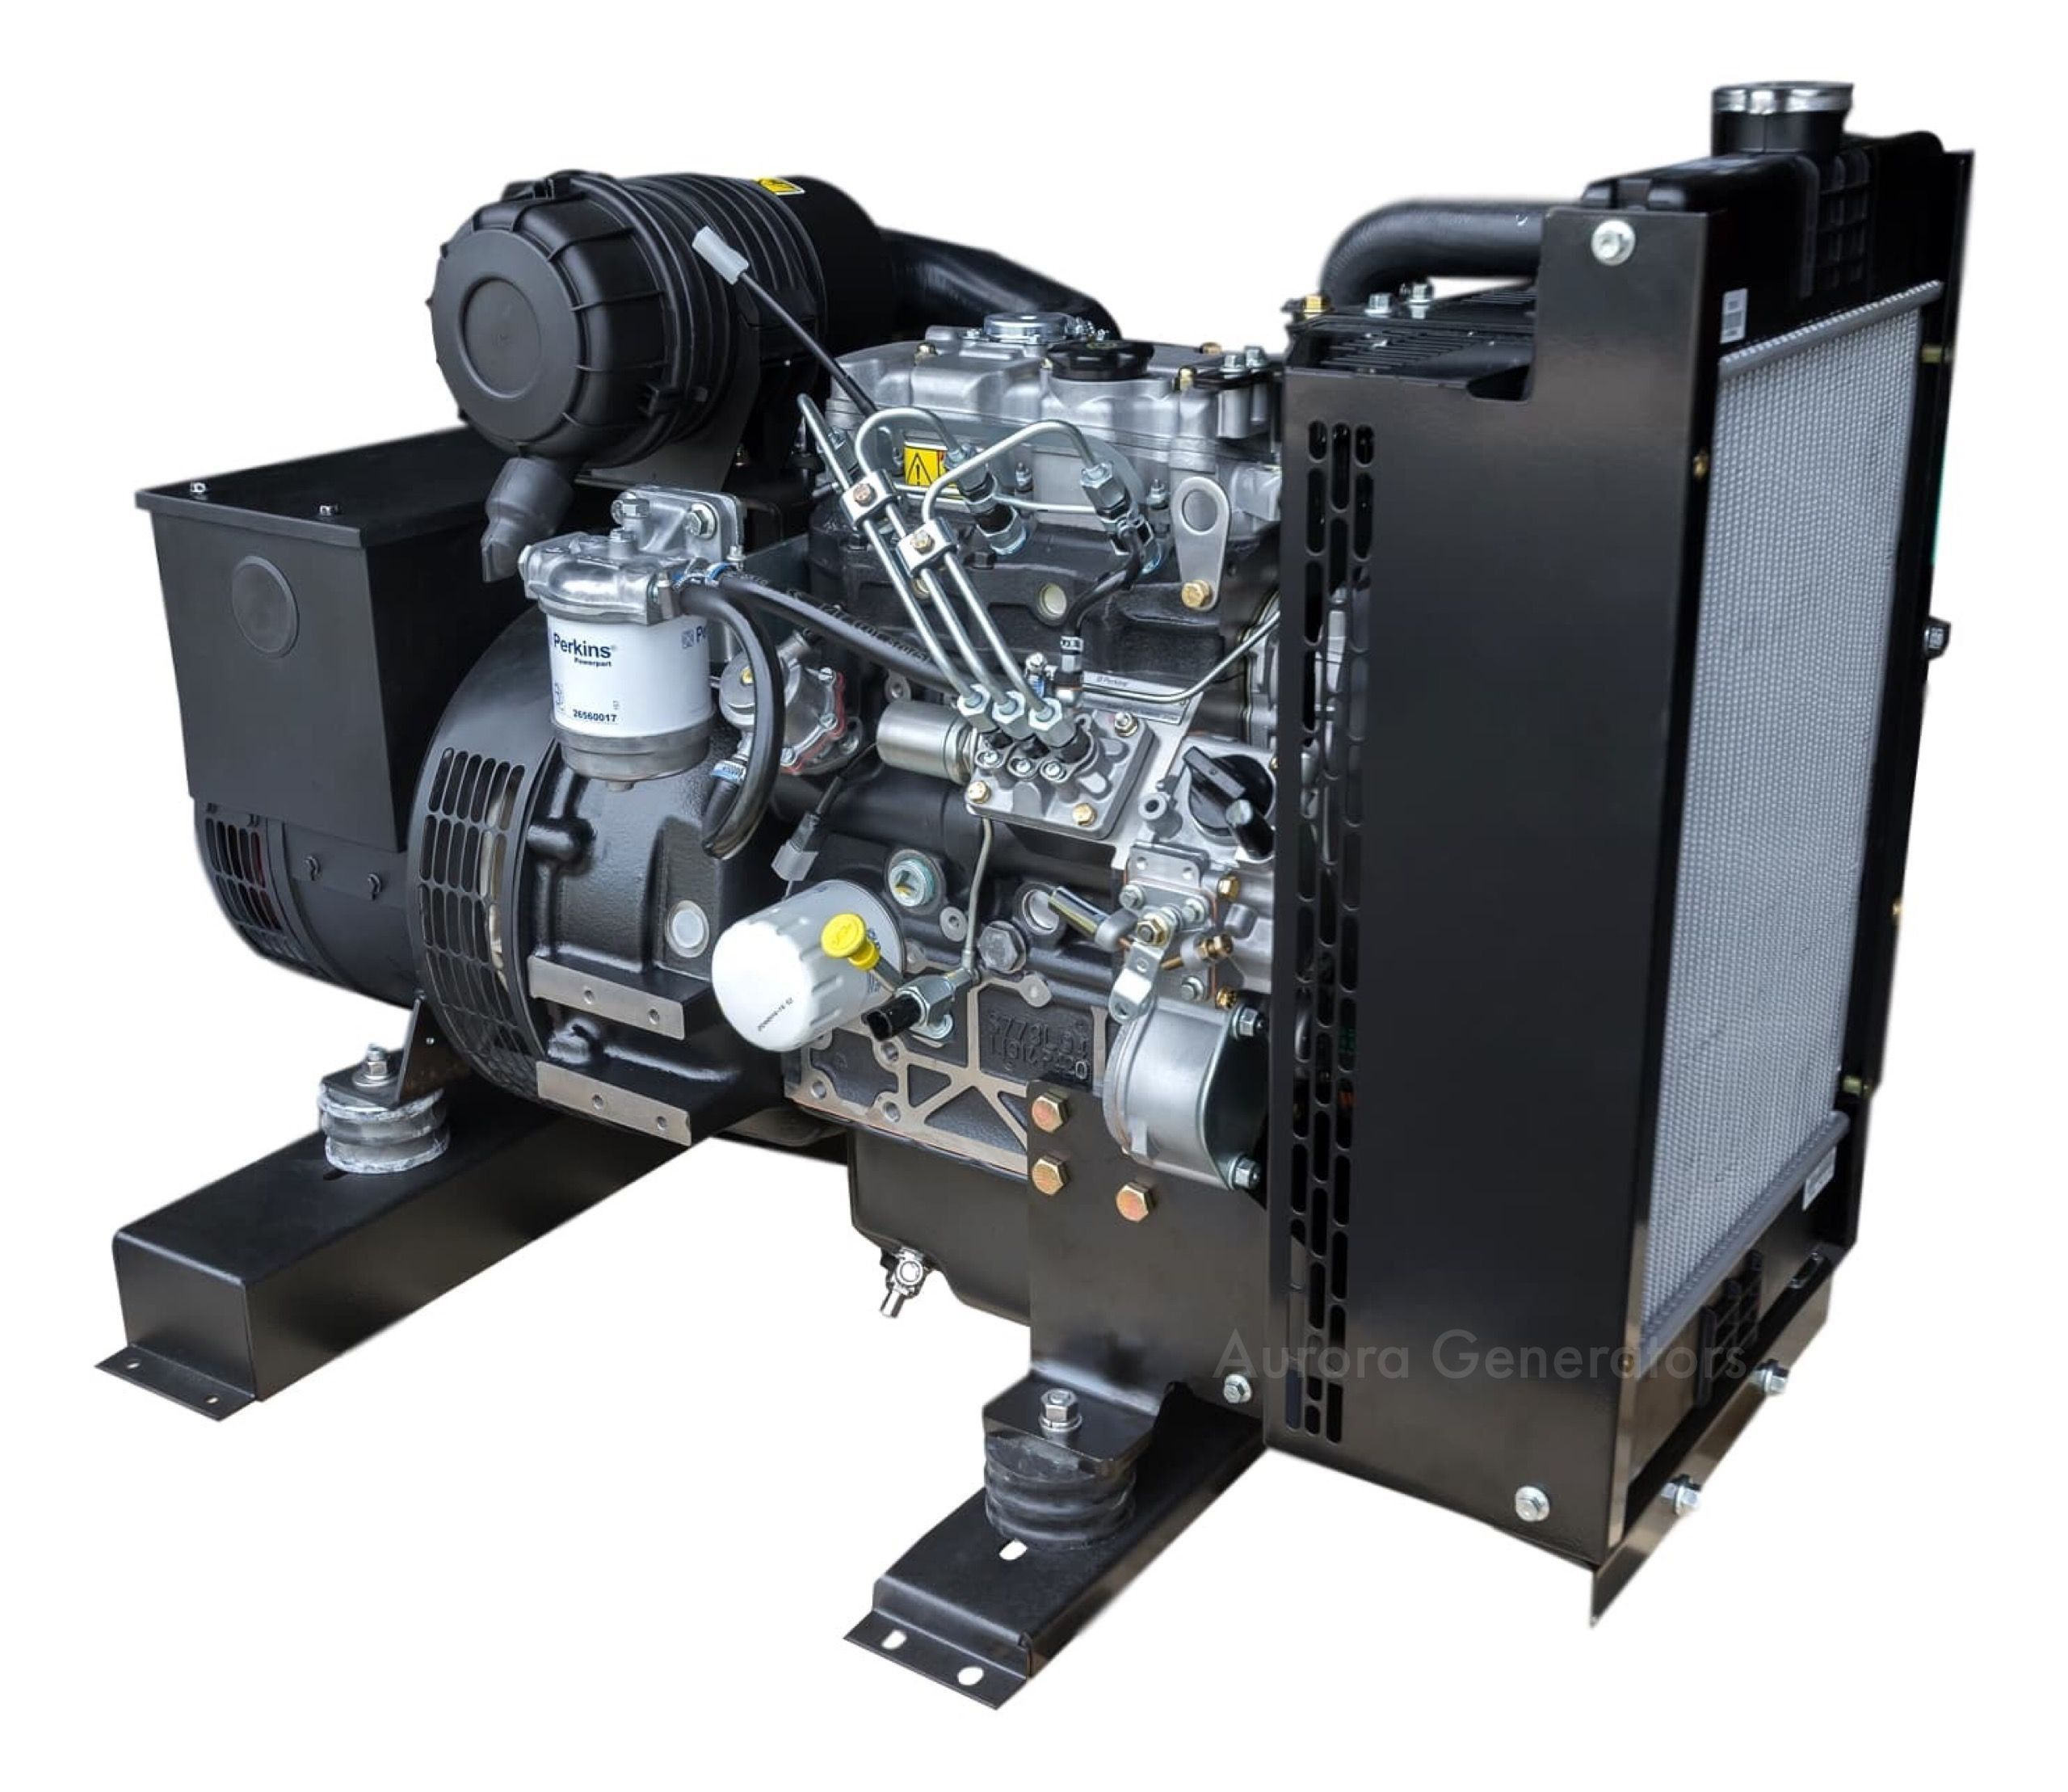 10 Kw Diesel Generator Bare Bones Aurora Generators Diesel Generators Generation Diesel